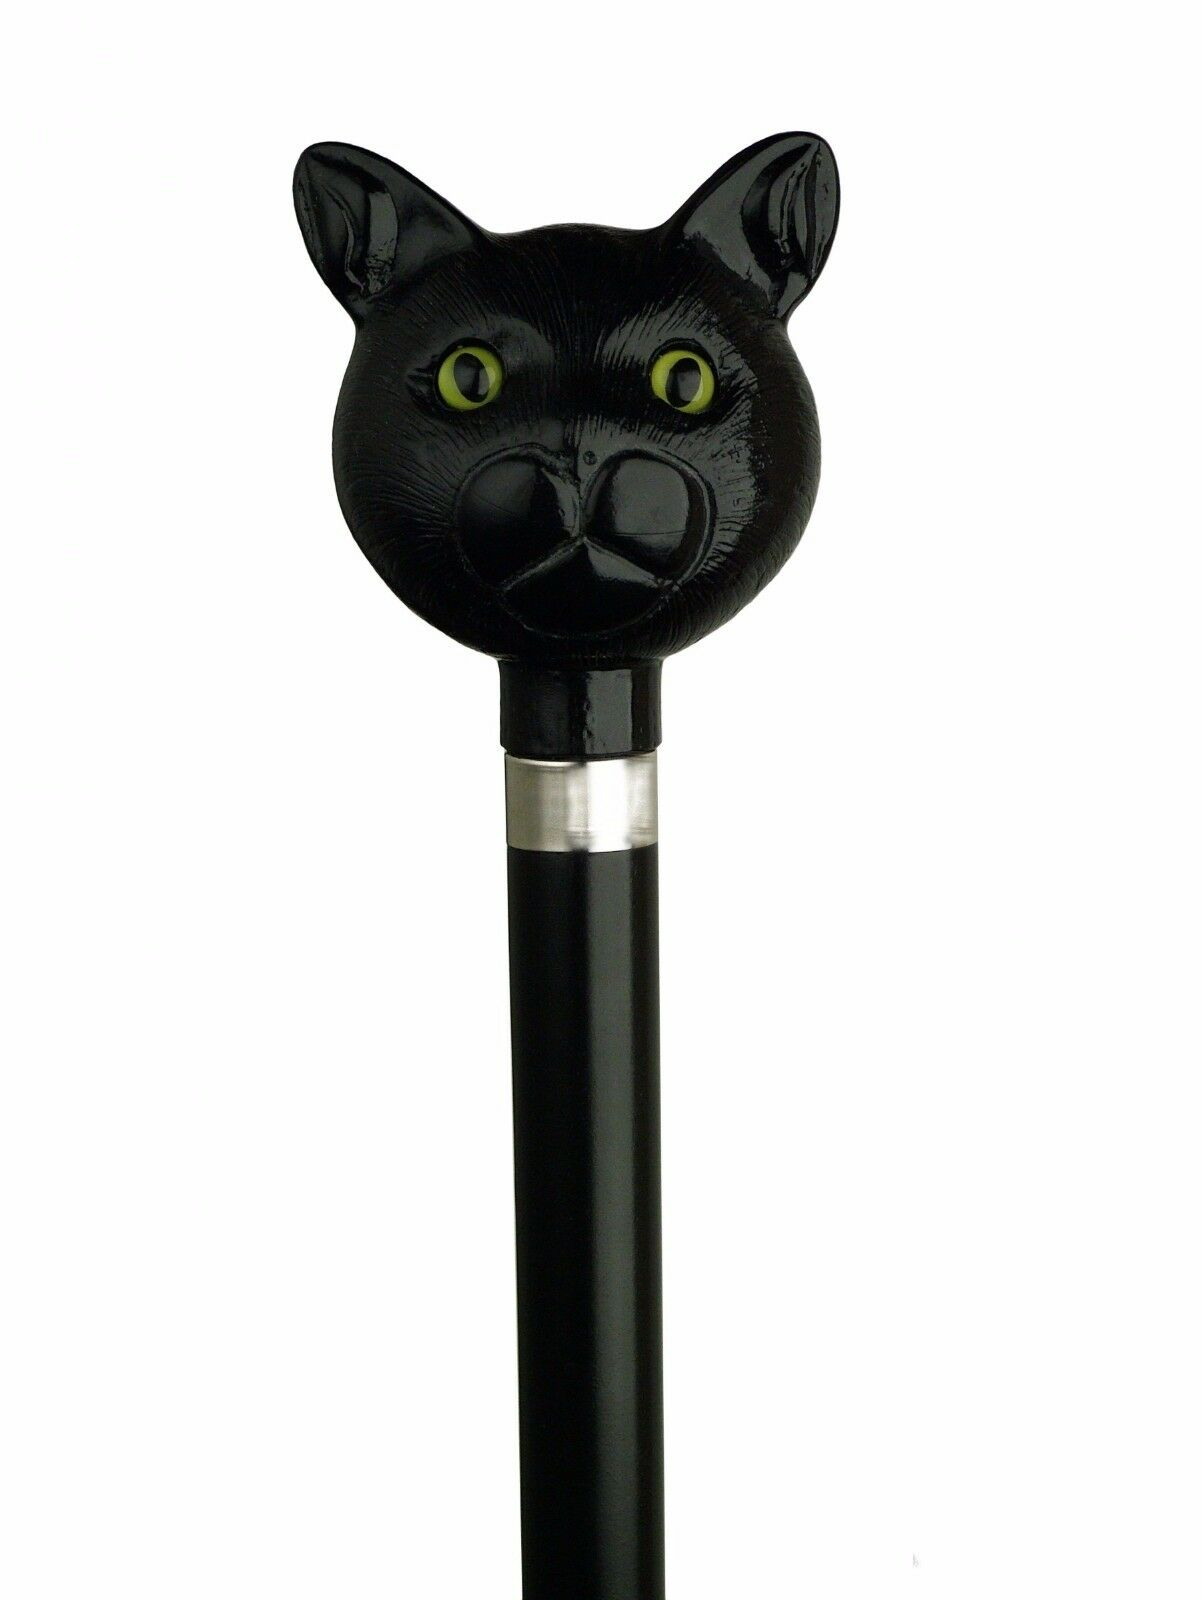 NEW! Harvy Cat-Lovers Black Cat Walking Stick Cane Catatude-